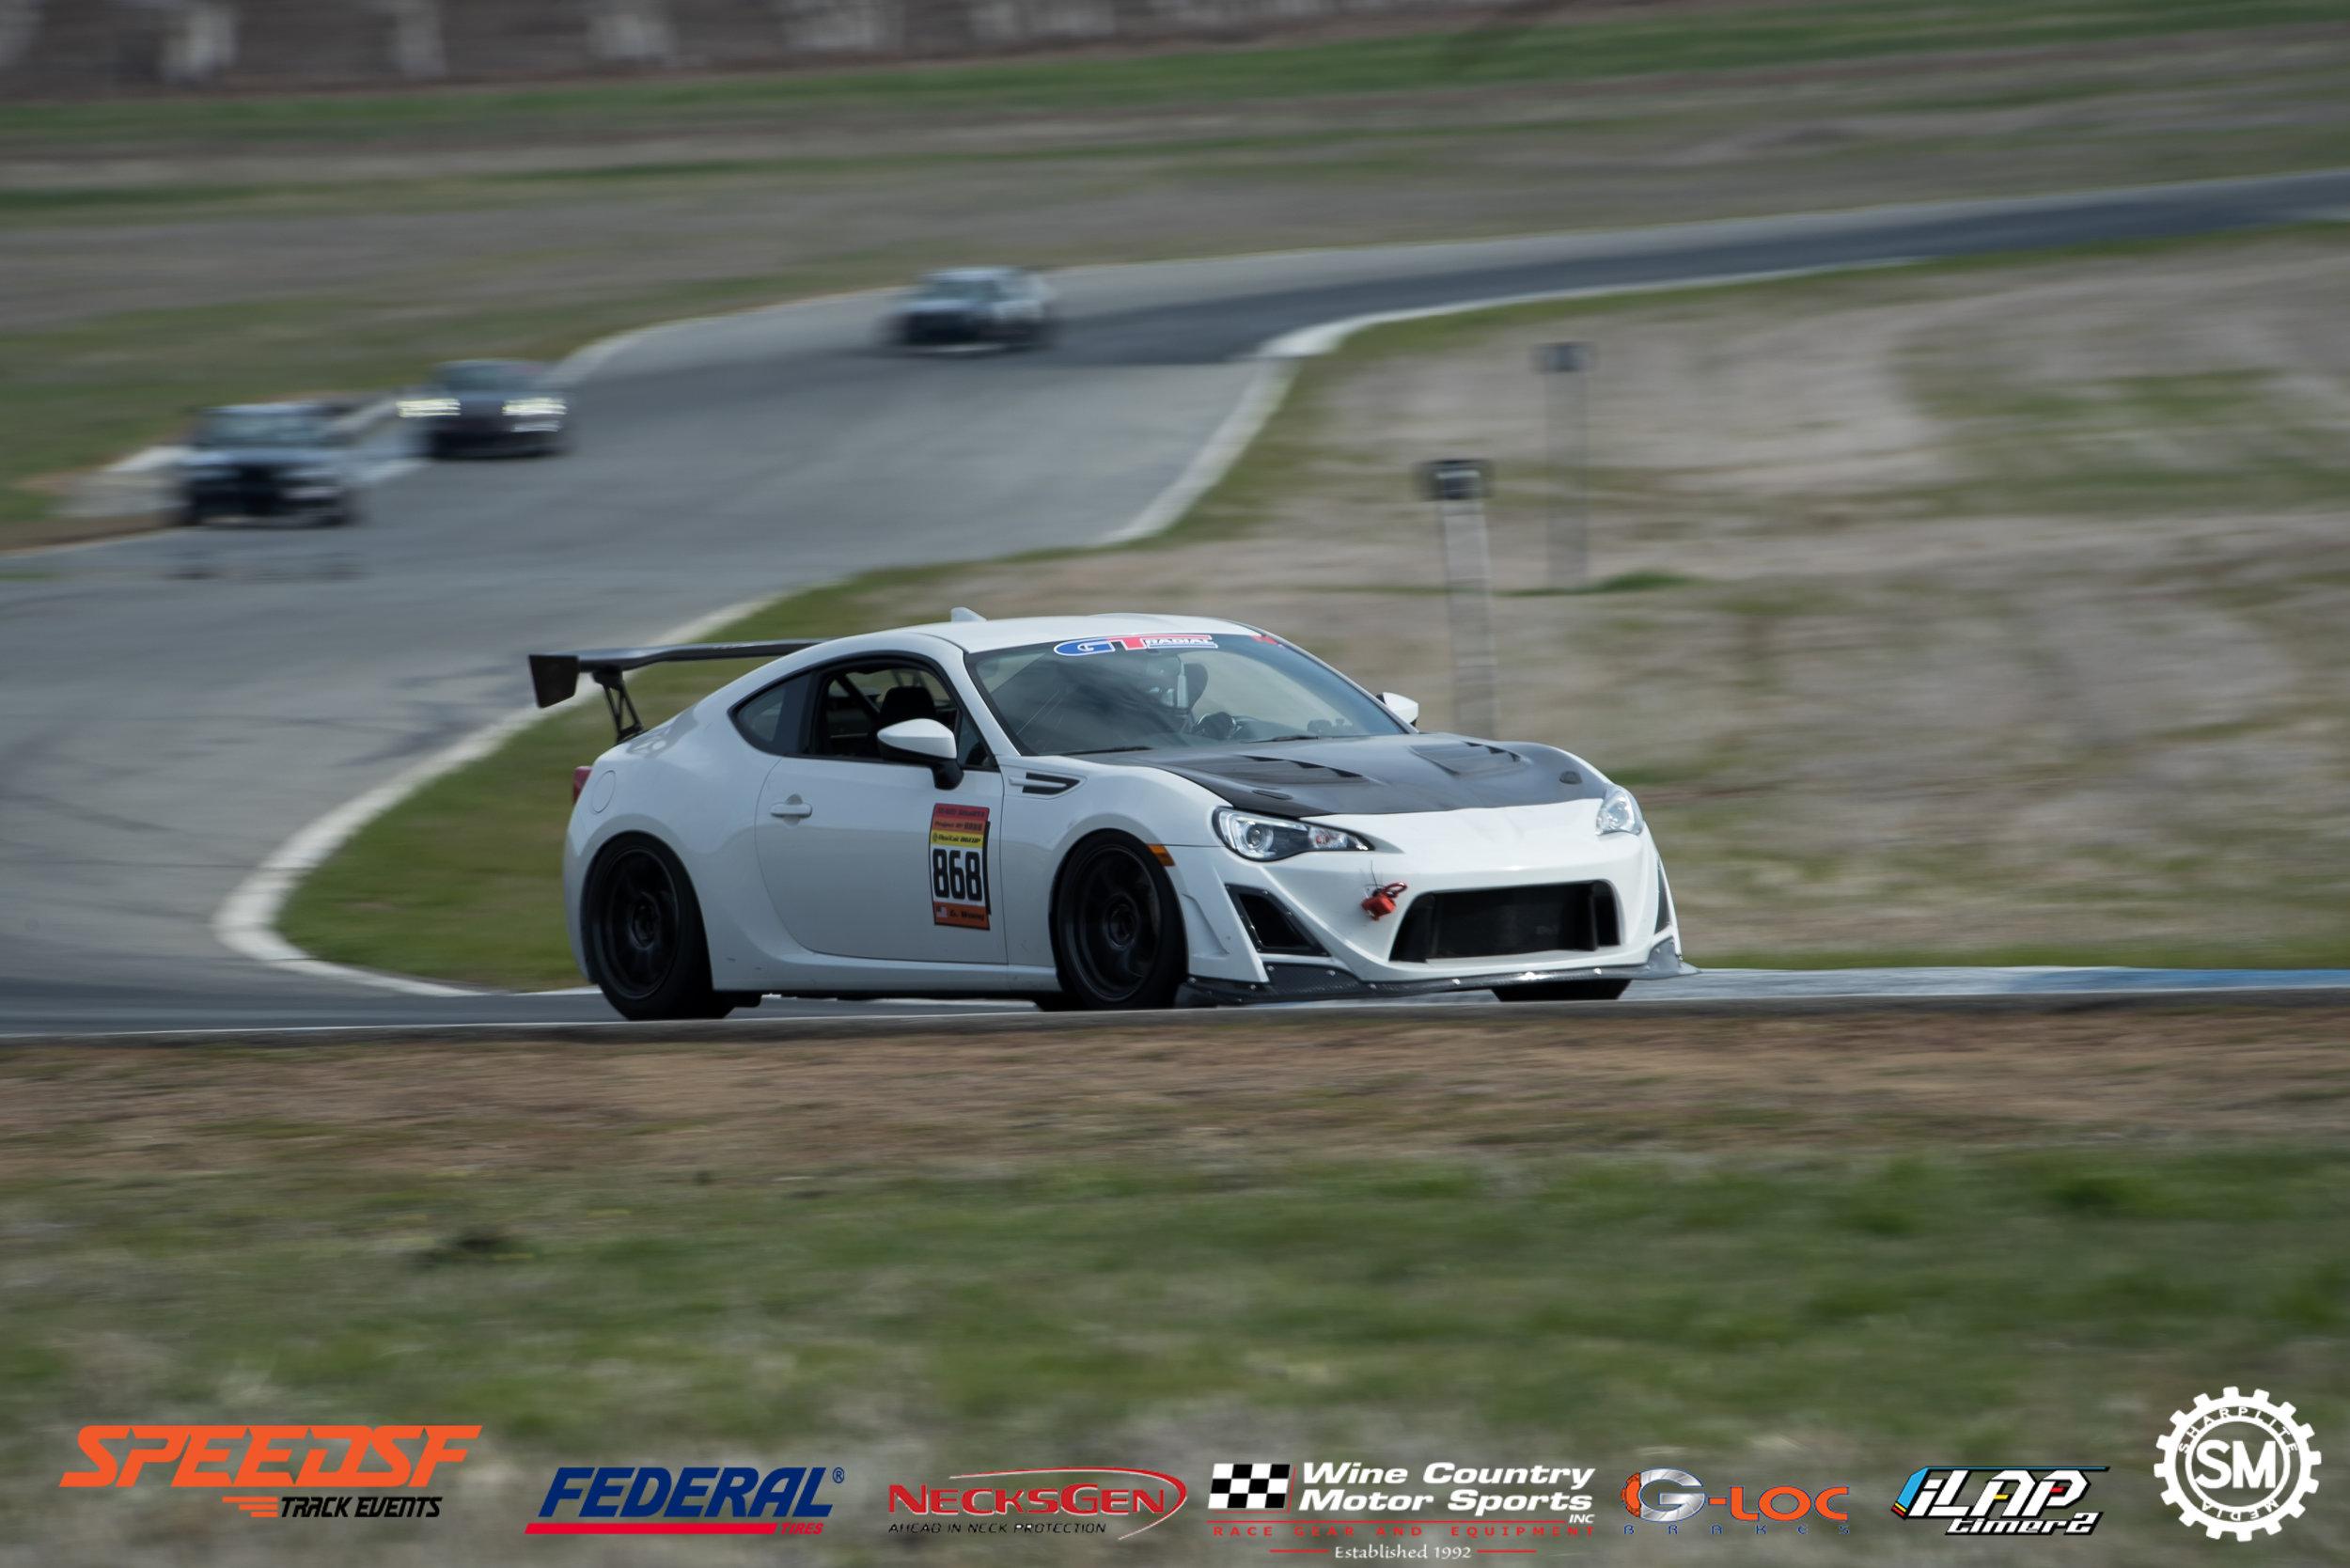 speedsf track saturday-267.jpg